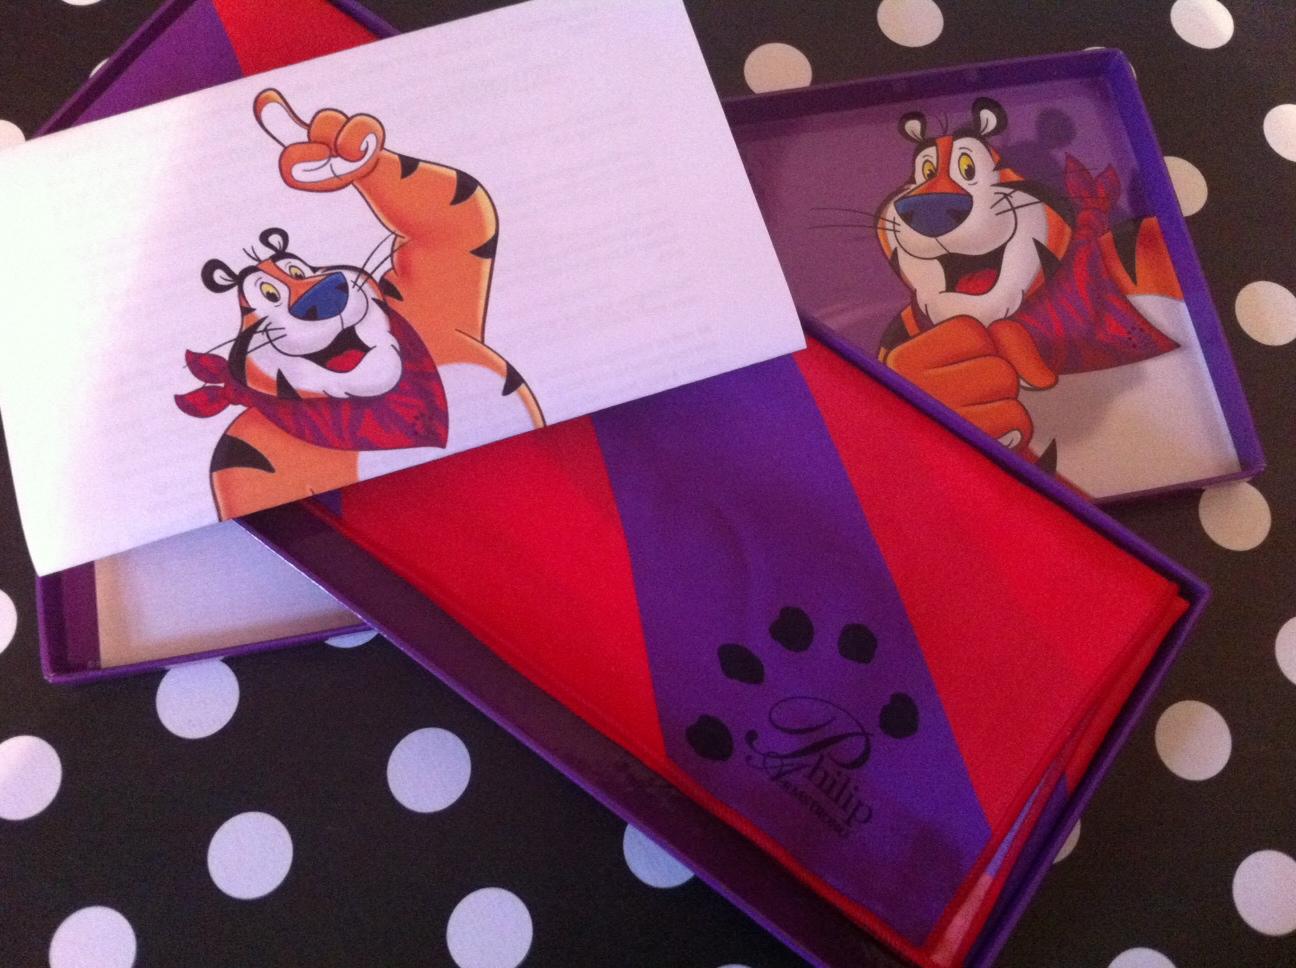 Tony the Tiger's Diamond Jubilee Limited Edition Scarf (it's grrrrrreat etc.)